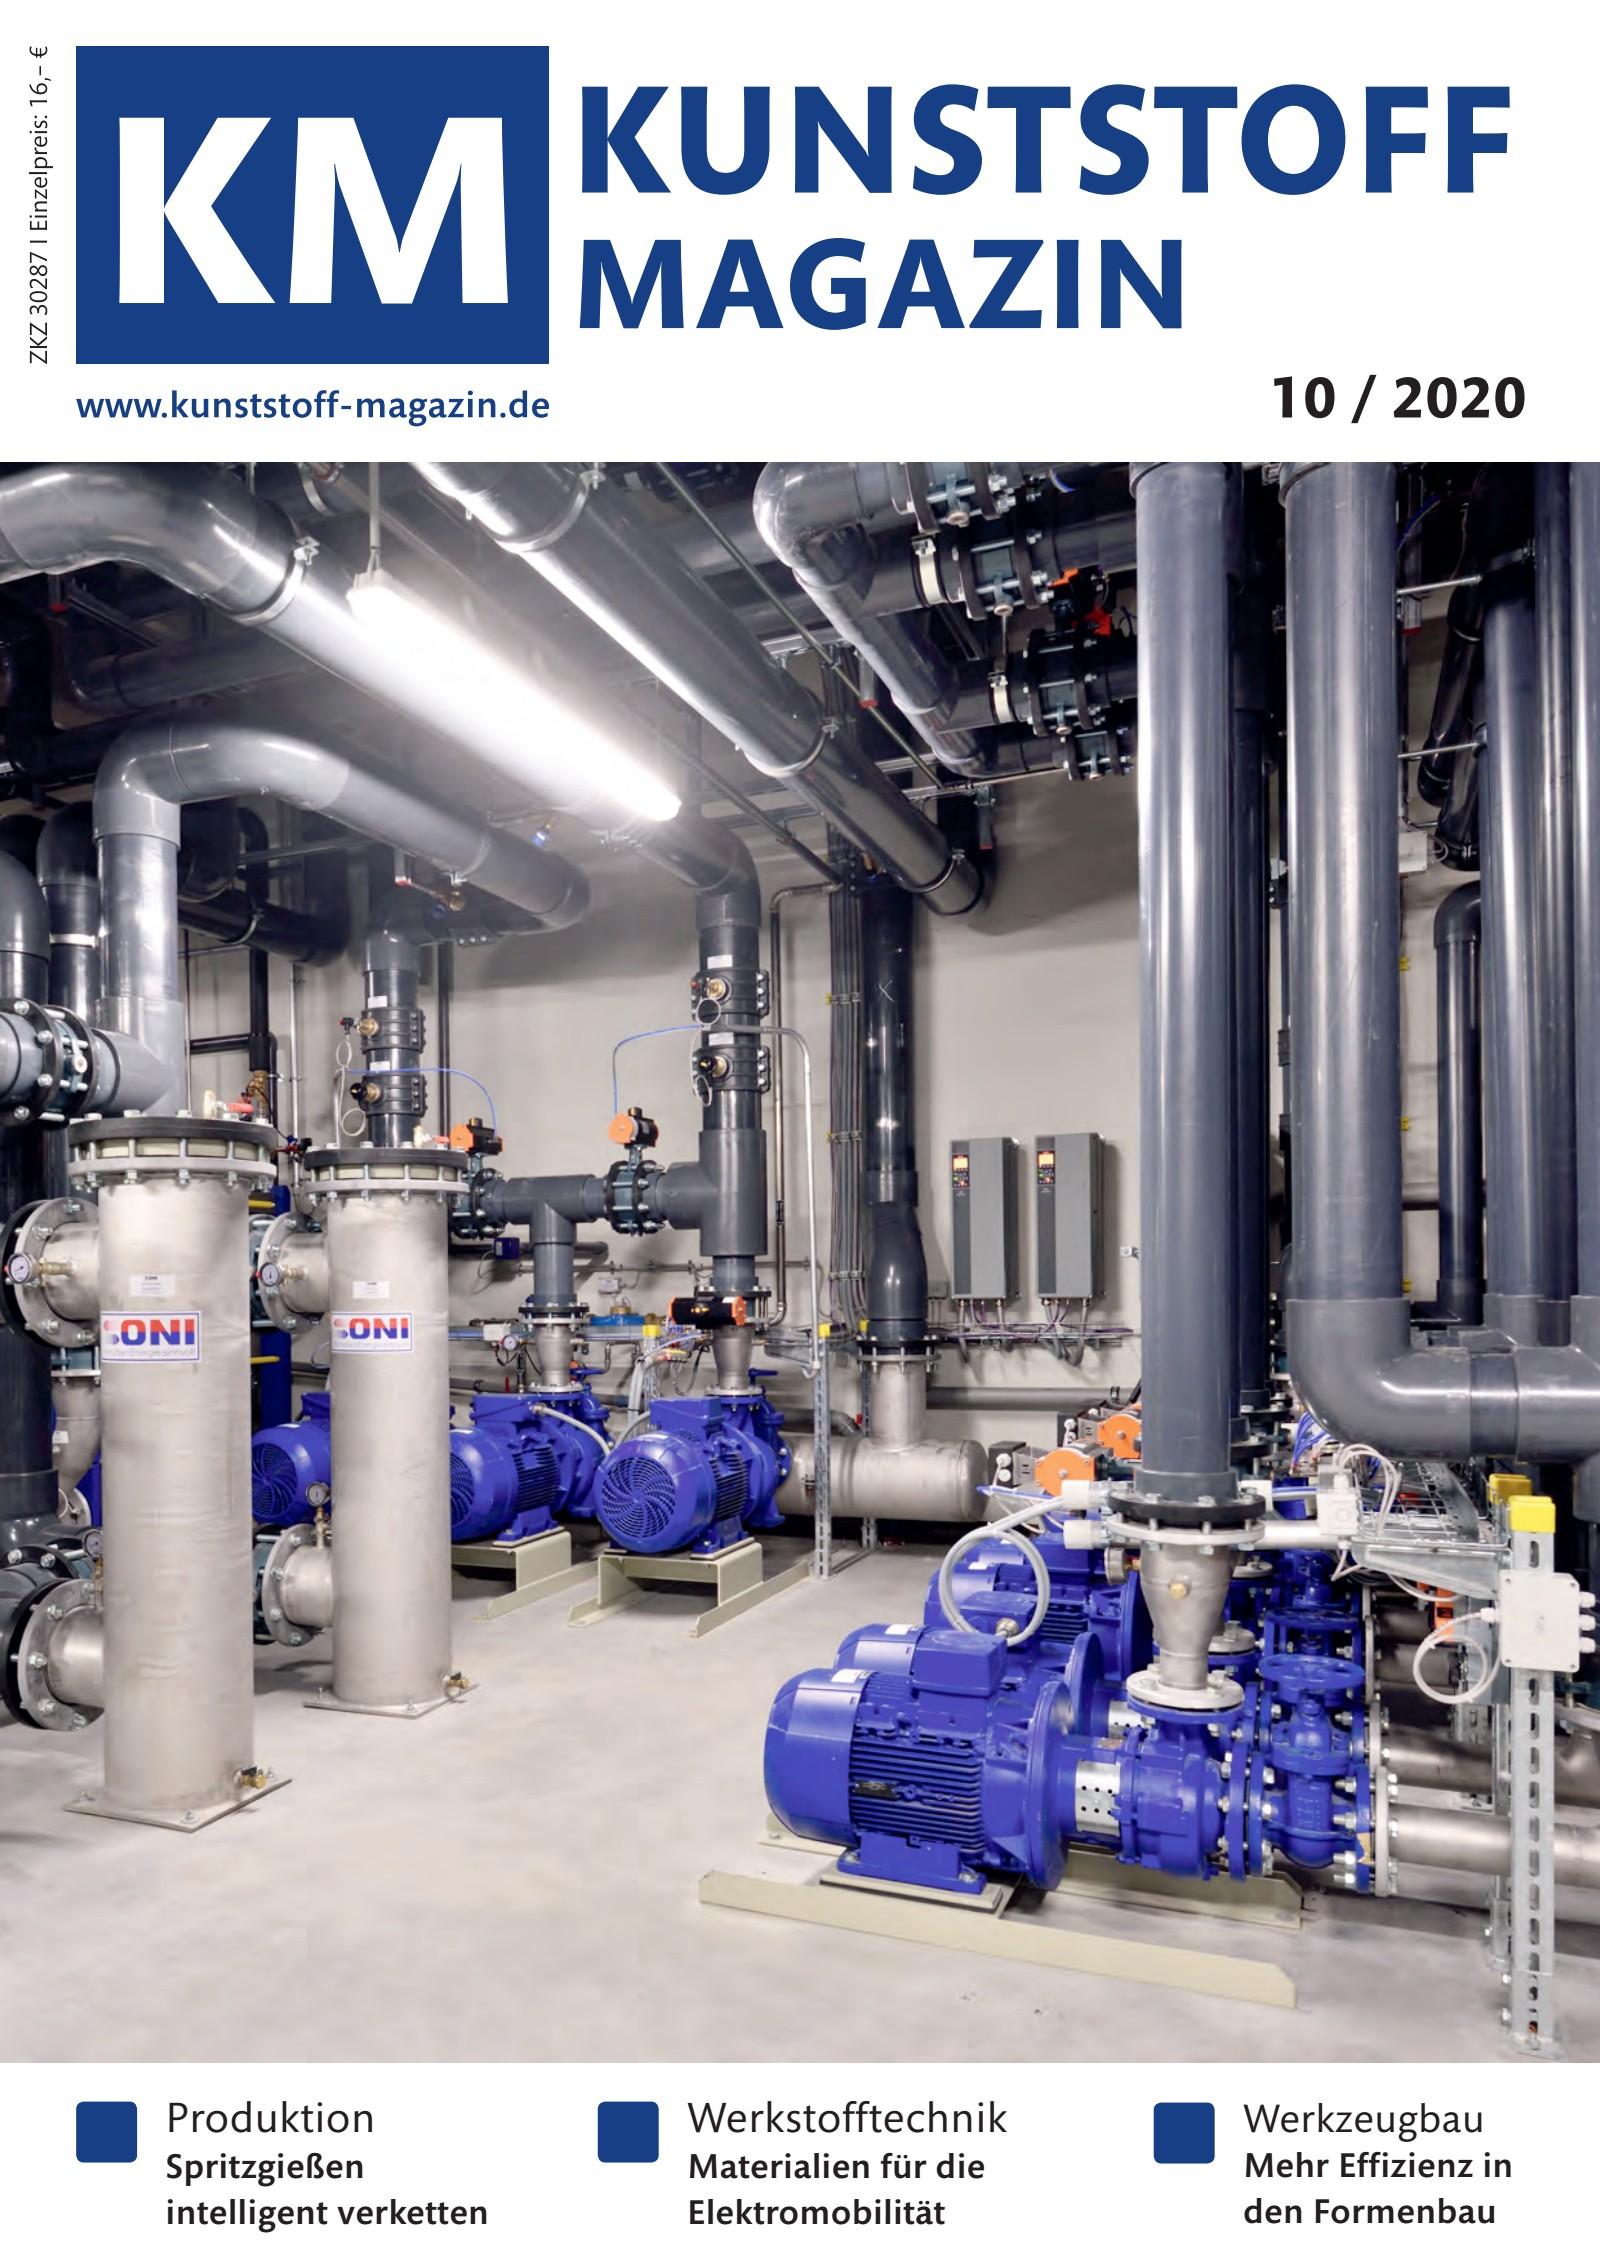 KUNSTSTOFF MAGAZIN 10/2020 Digital